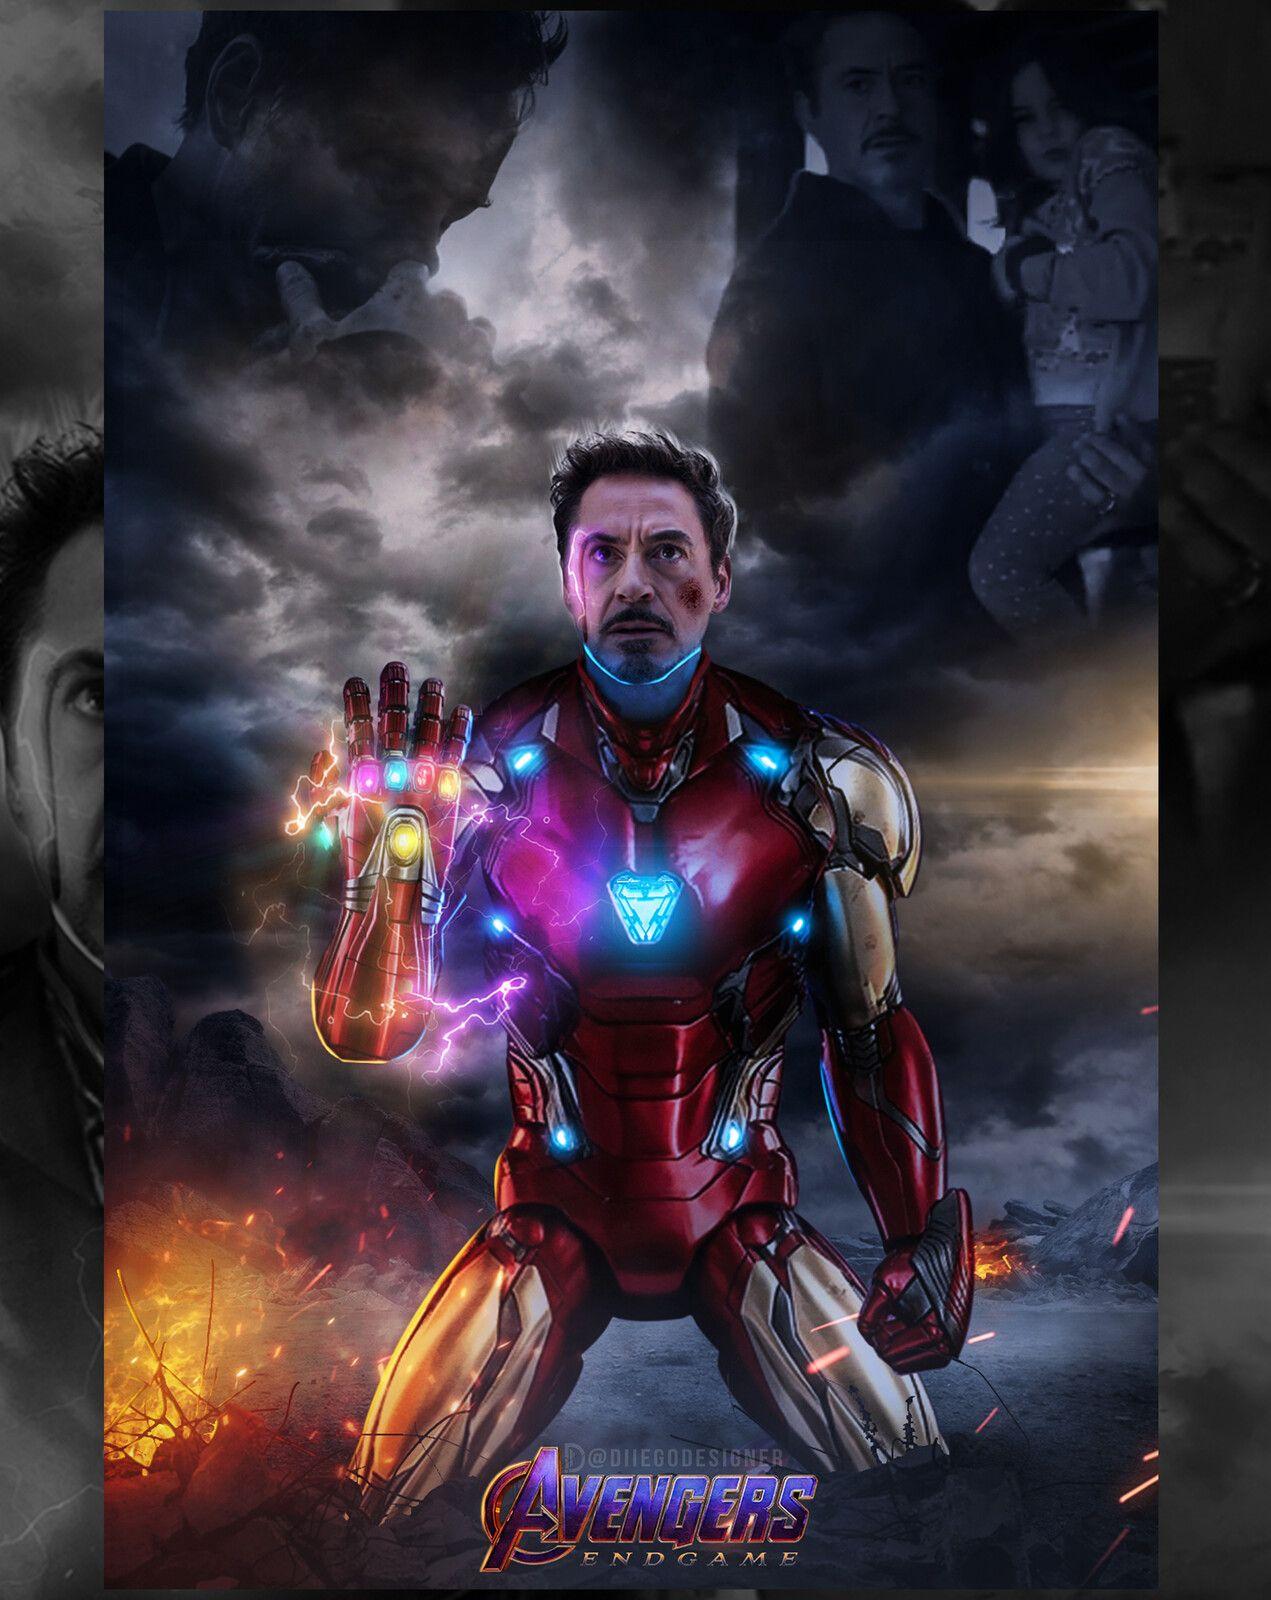 I Am Iron Man Diiego Designer On Artstation At Https Www Artstation Com Artwork Ya4w8k Iron Man Avengers Marvel Superheroes Marvel Comics Wallpaper